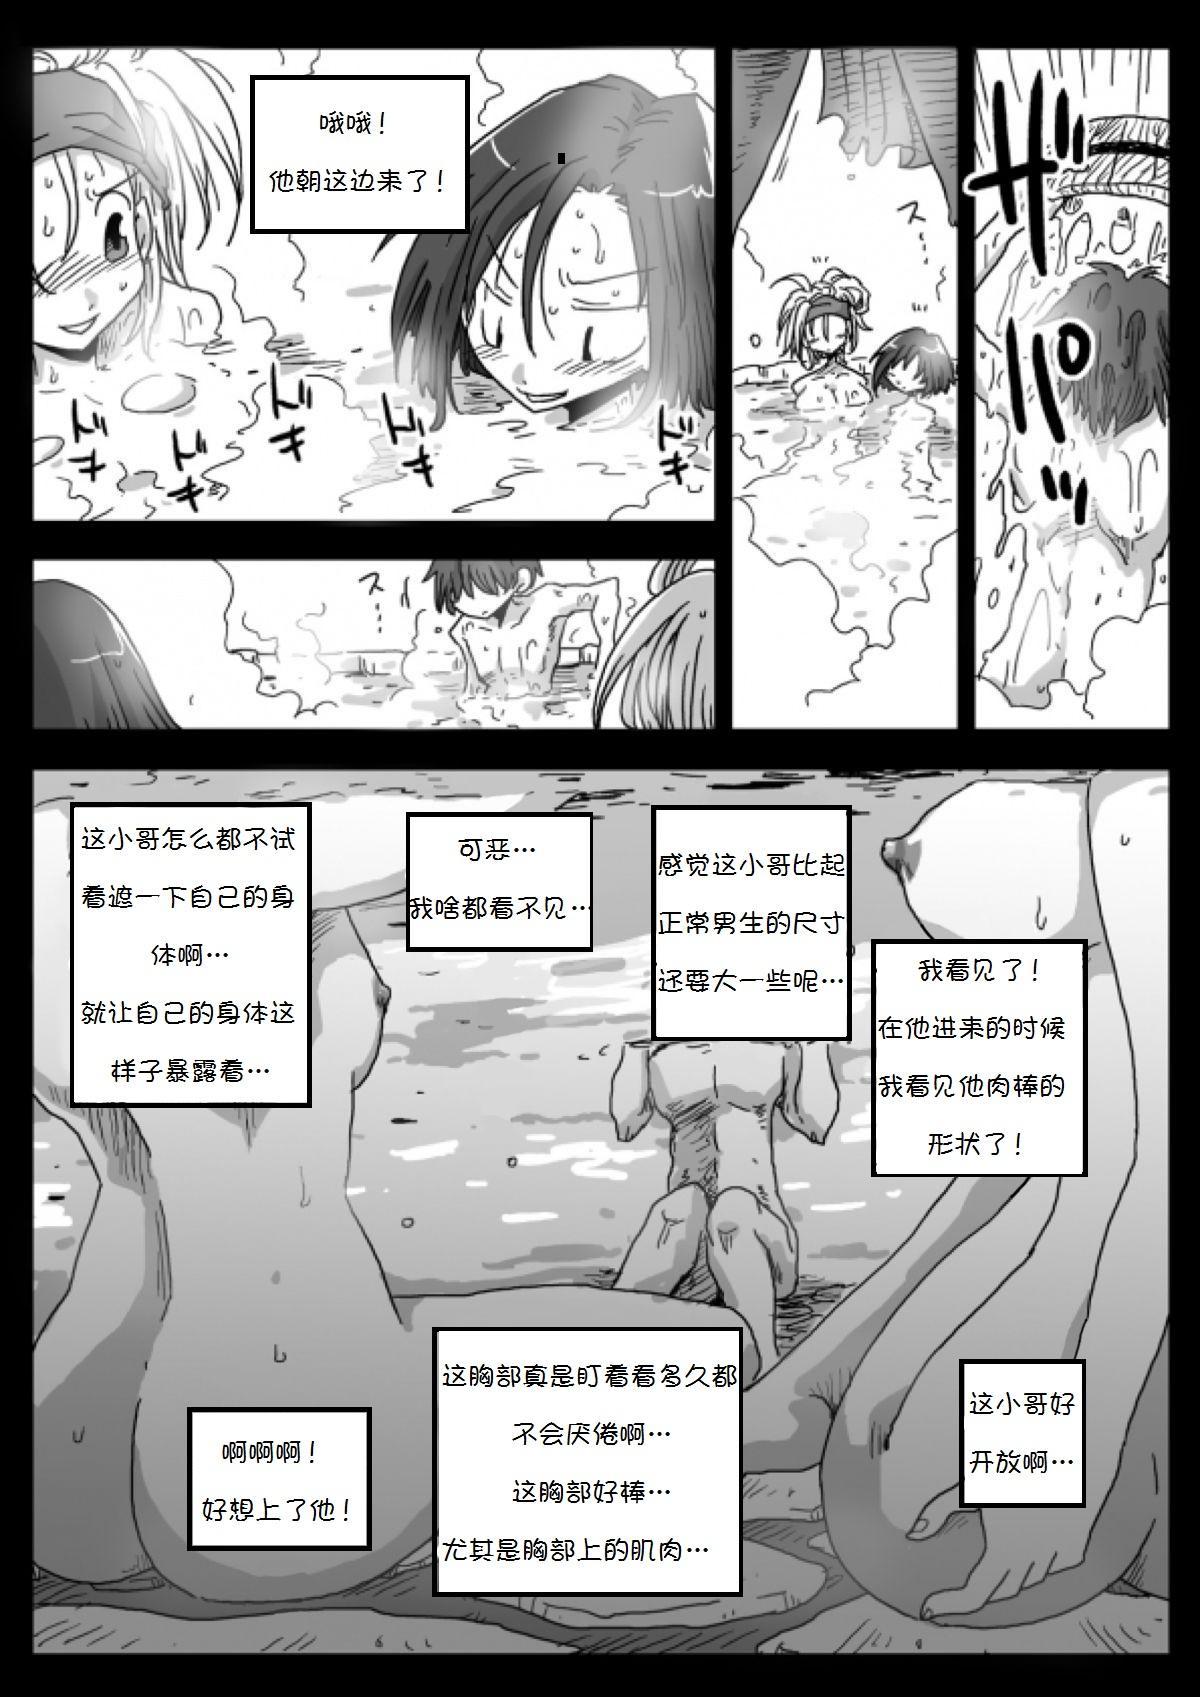 Teisou Gyakuten Sekai Konyoku Onsen 10